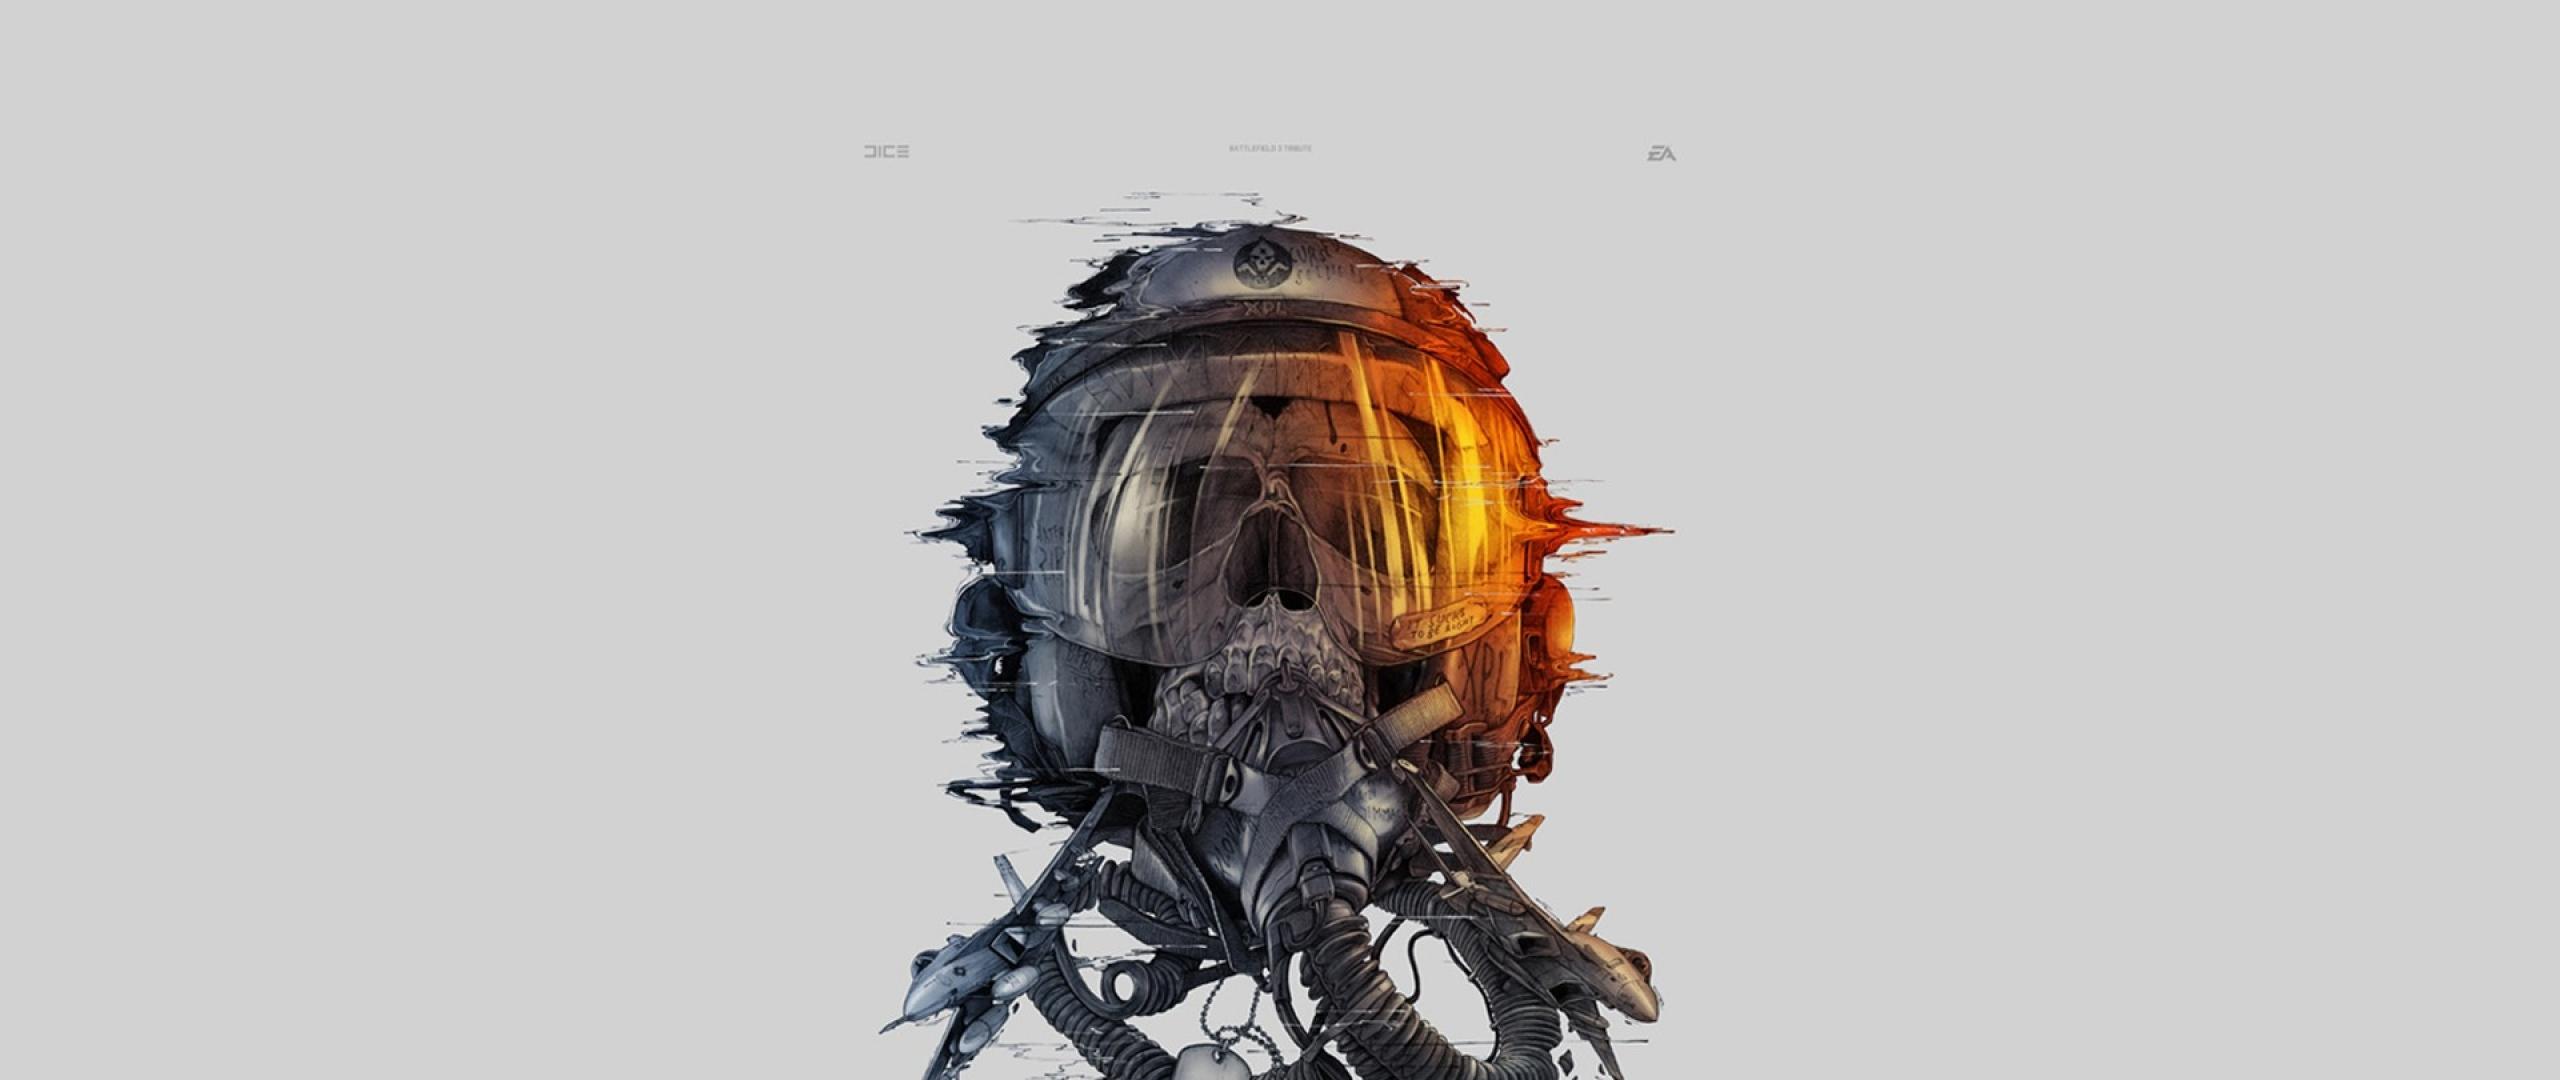 game wallpaper hd 1080p free download